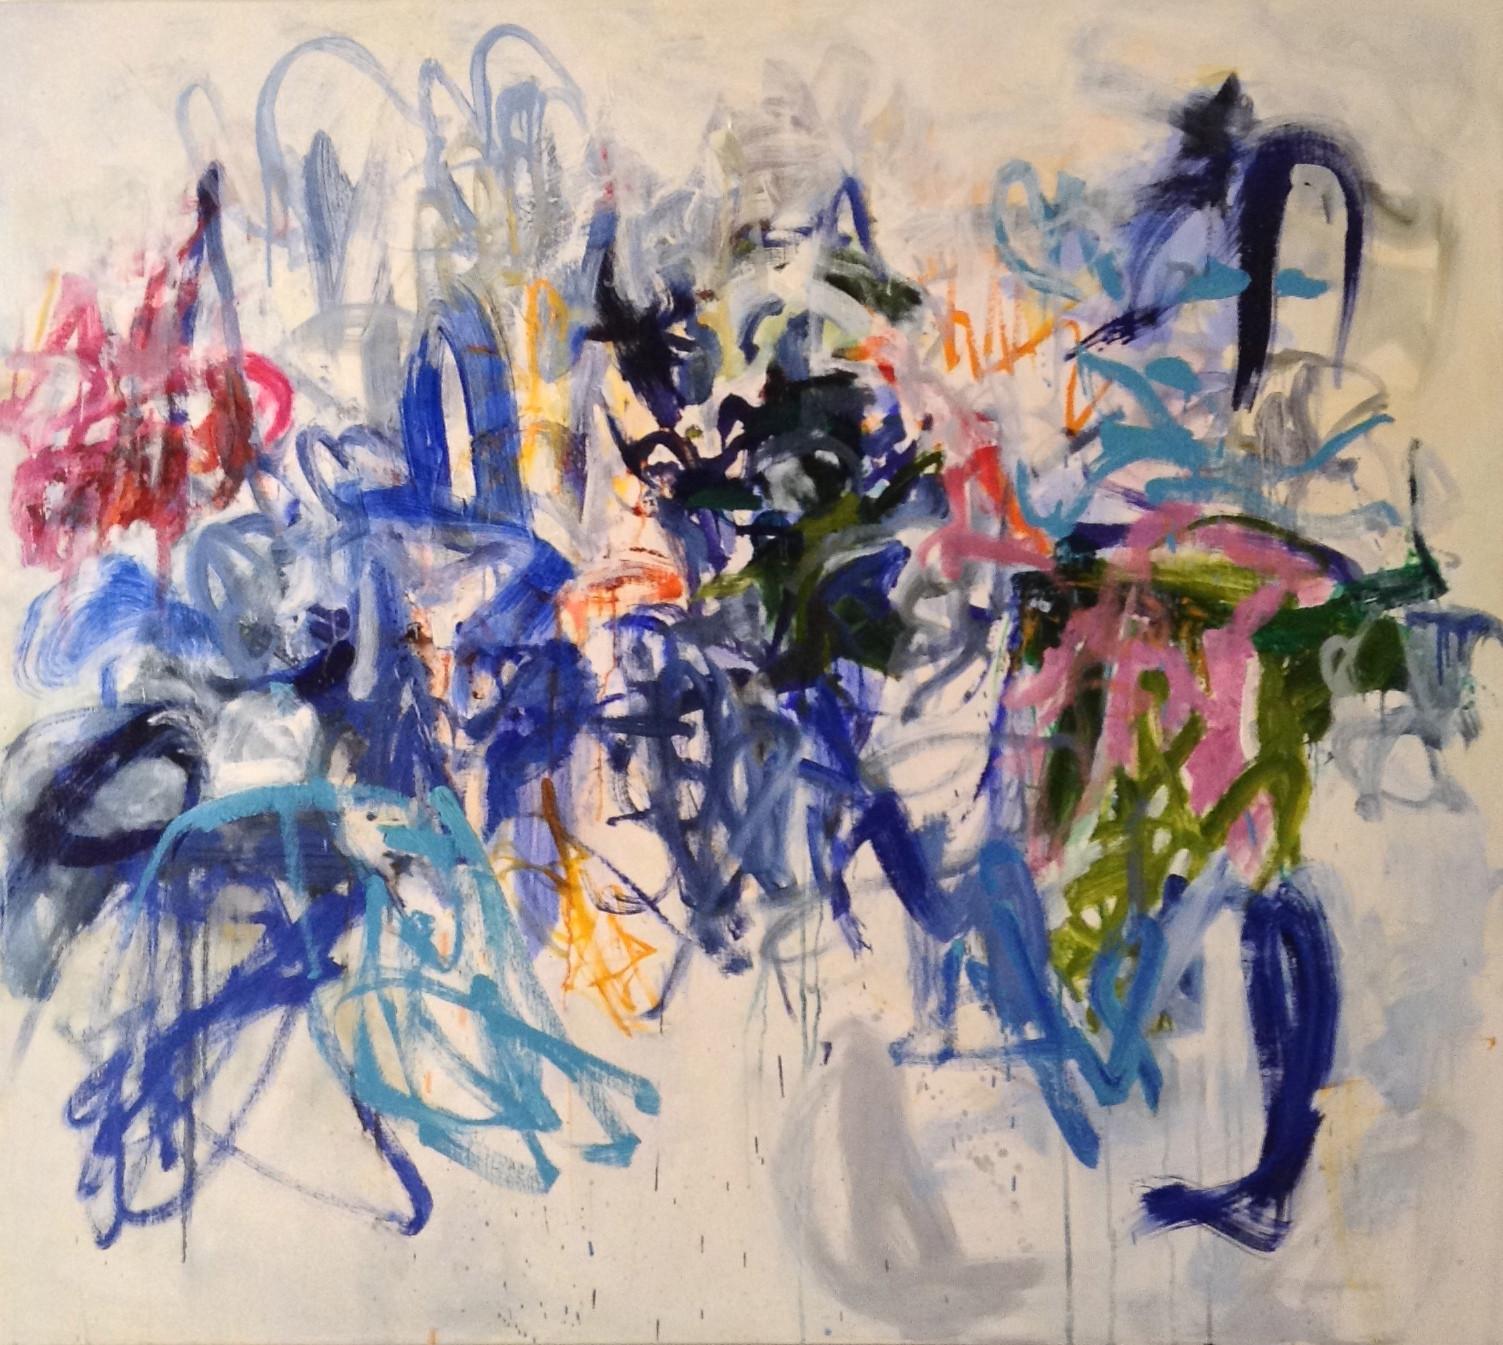 LOBELIA 48 x 54 oil on canvas SOLD